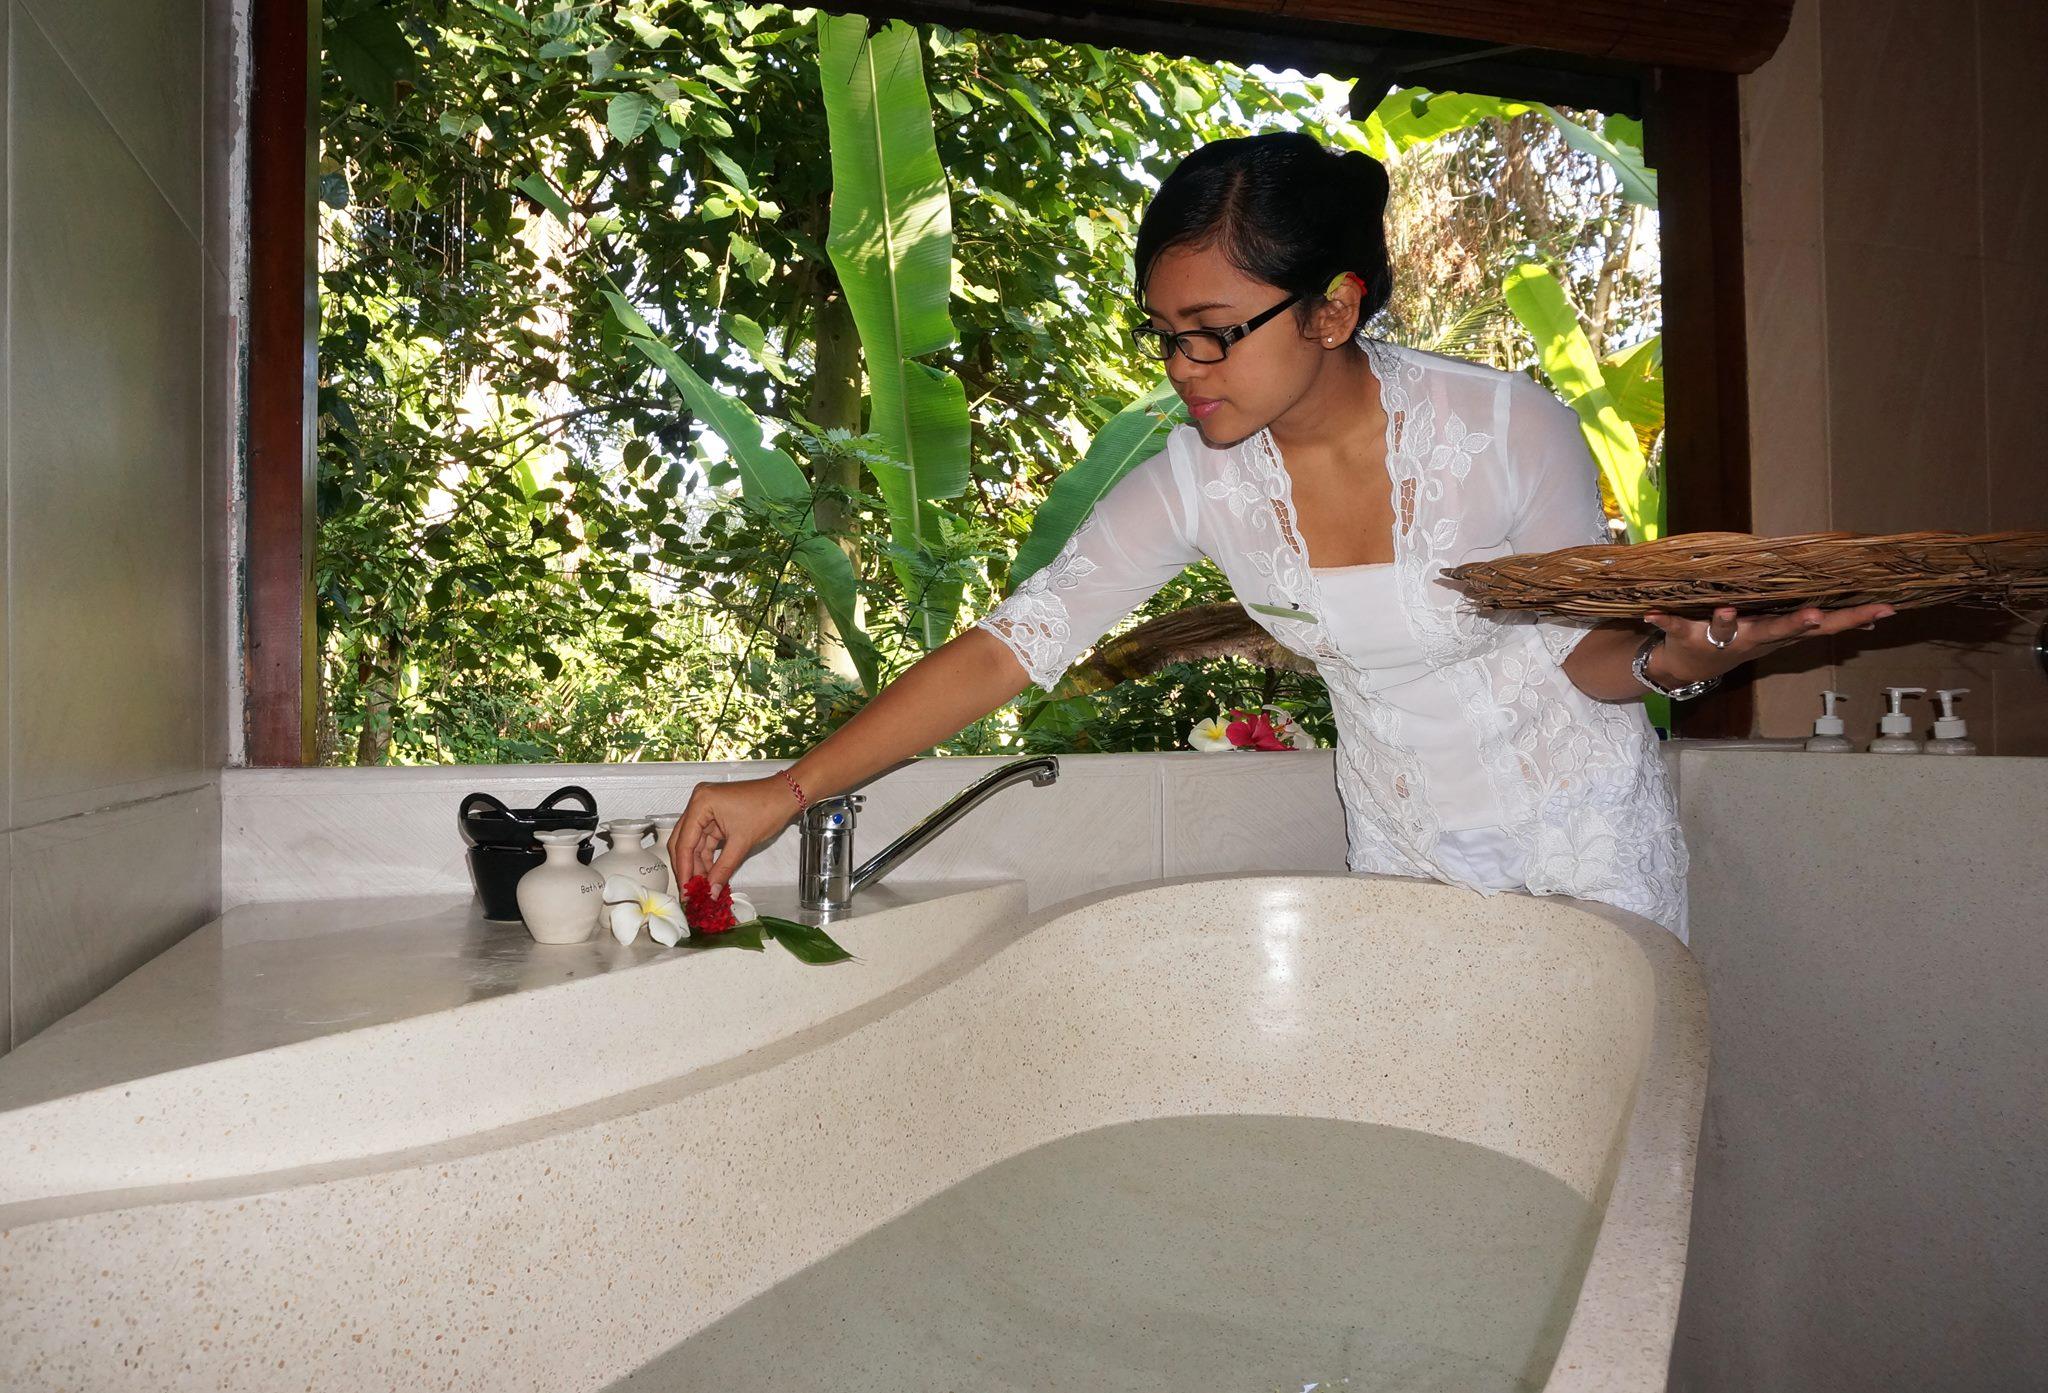 botanica-day-spa-ayurveda-center-bali-indonesia-15